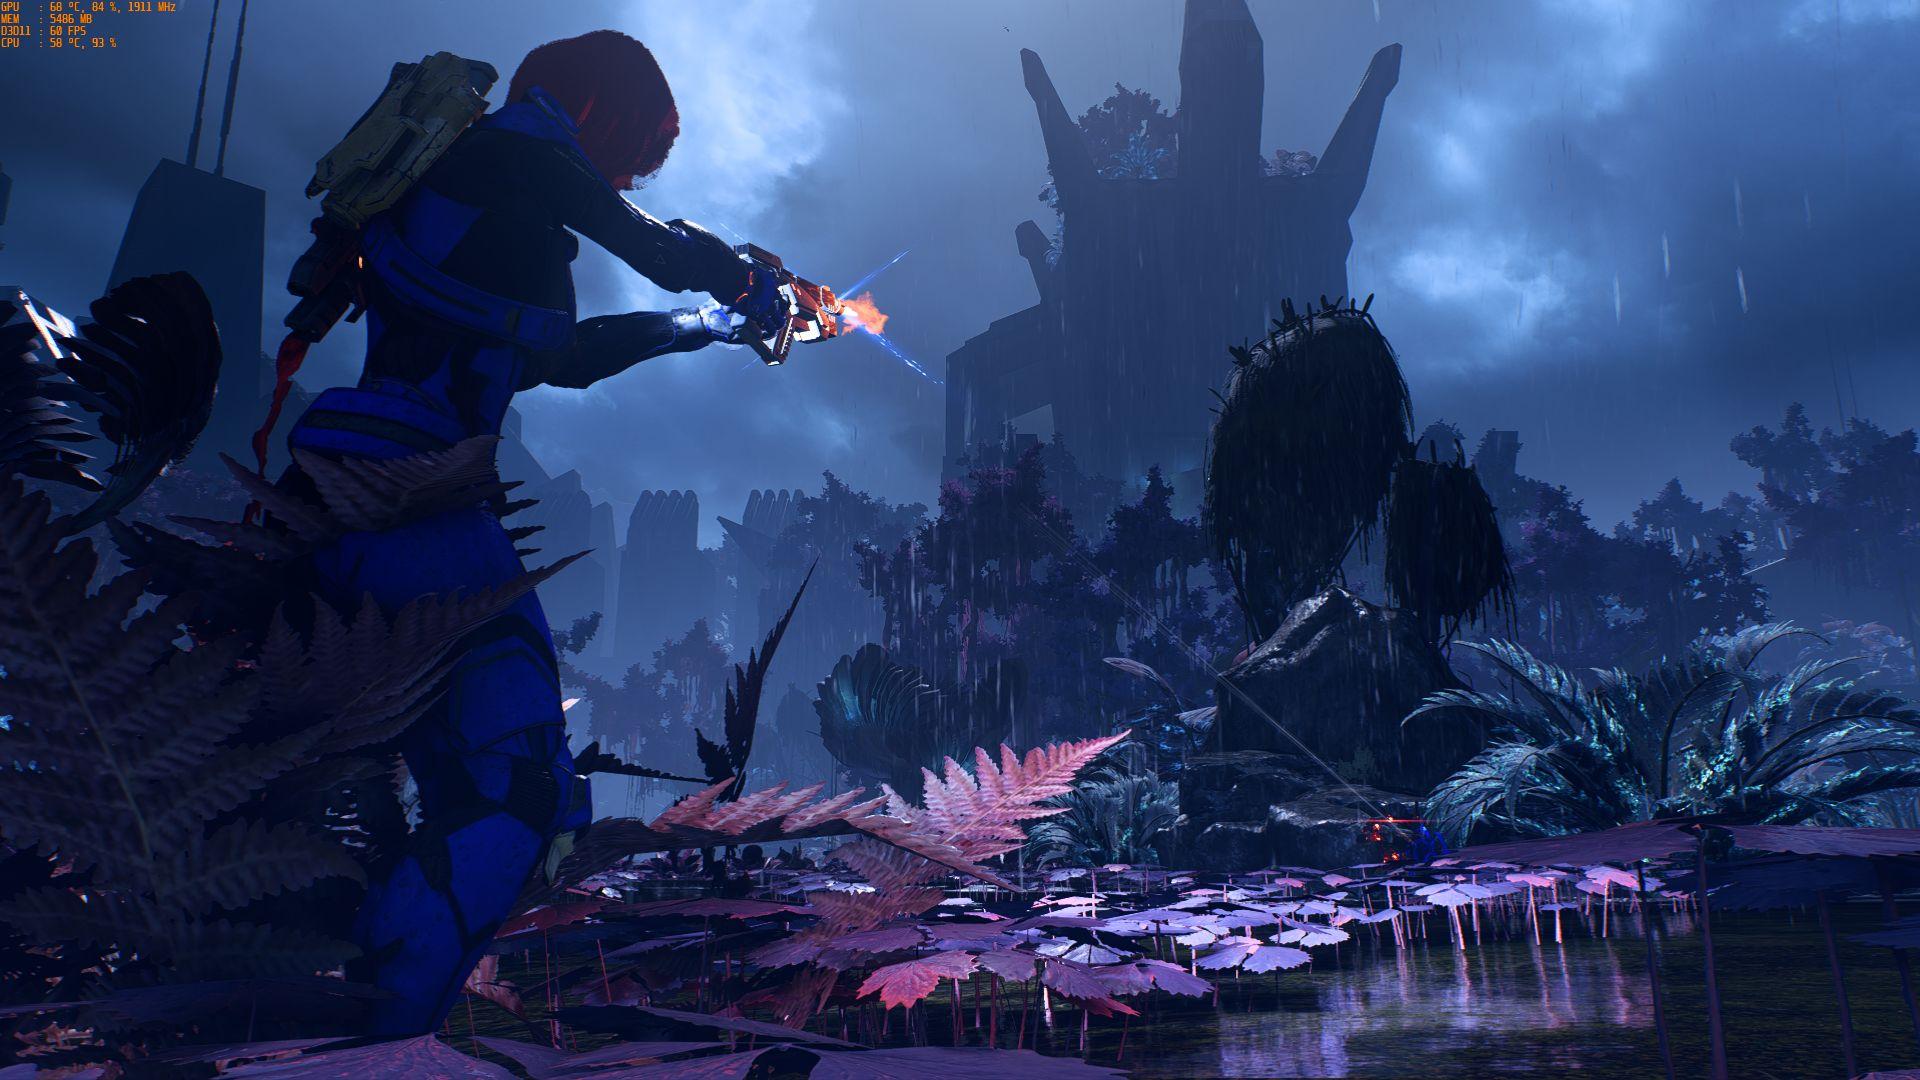 Mass Effect Andromeda Screenshot 2017.07.23 - 17.22.15.80.jpg - Mass Effect: Andromeda